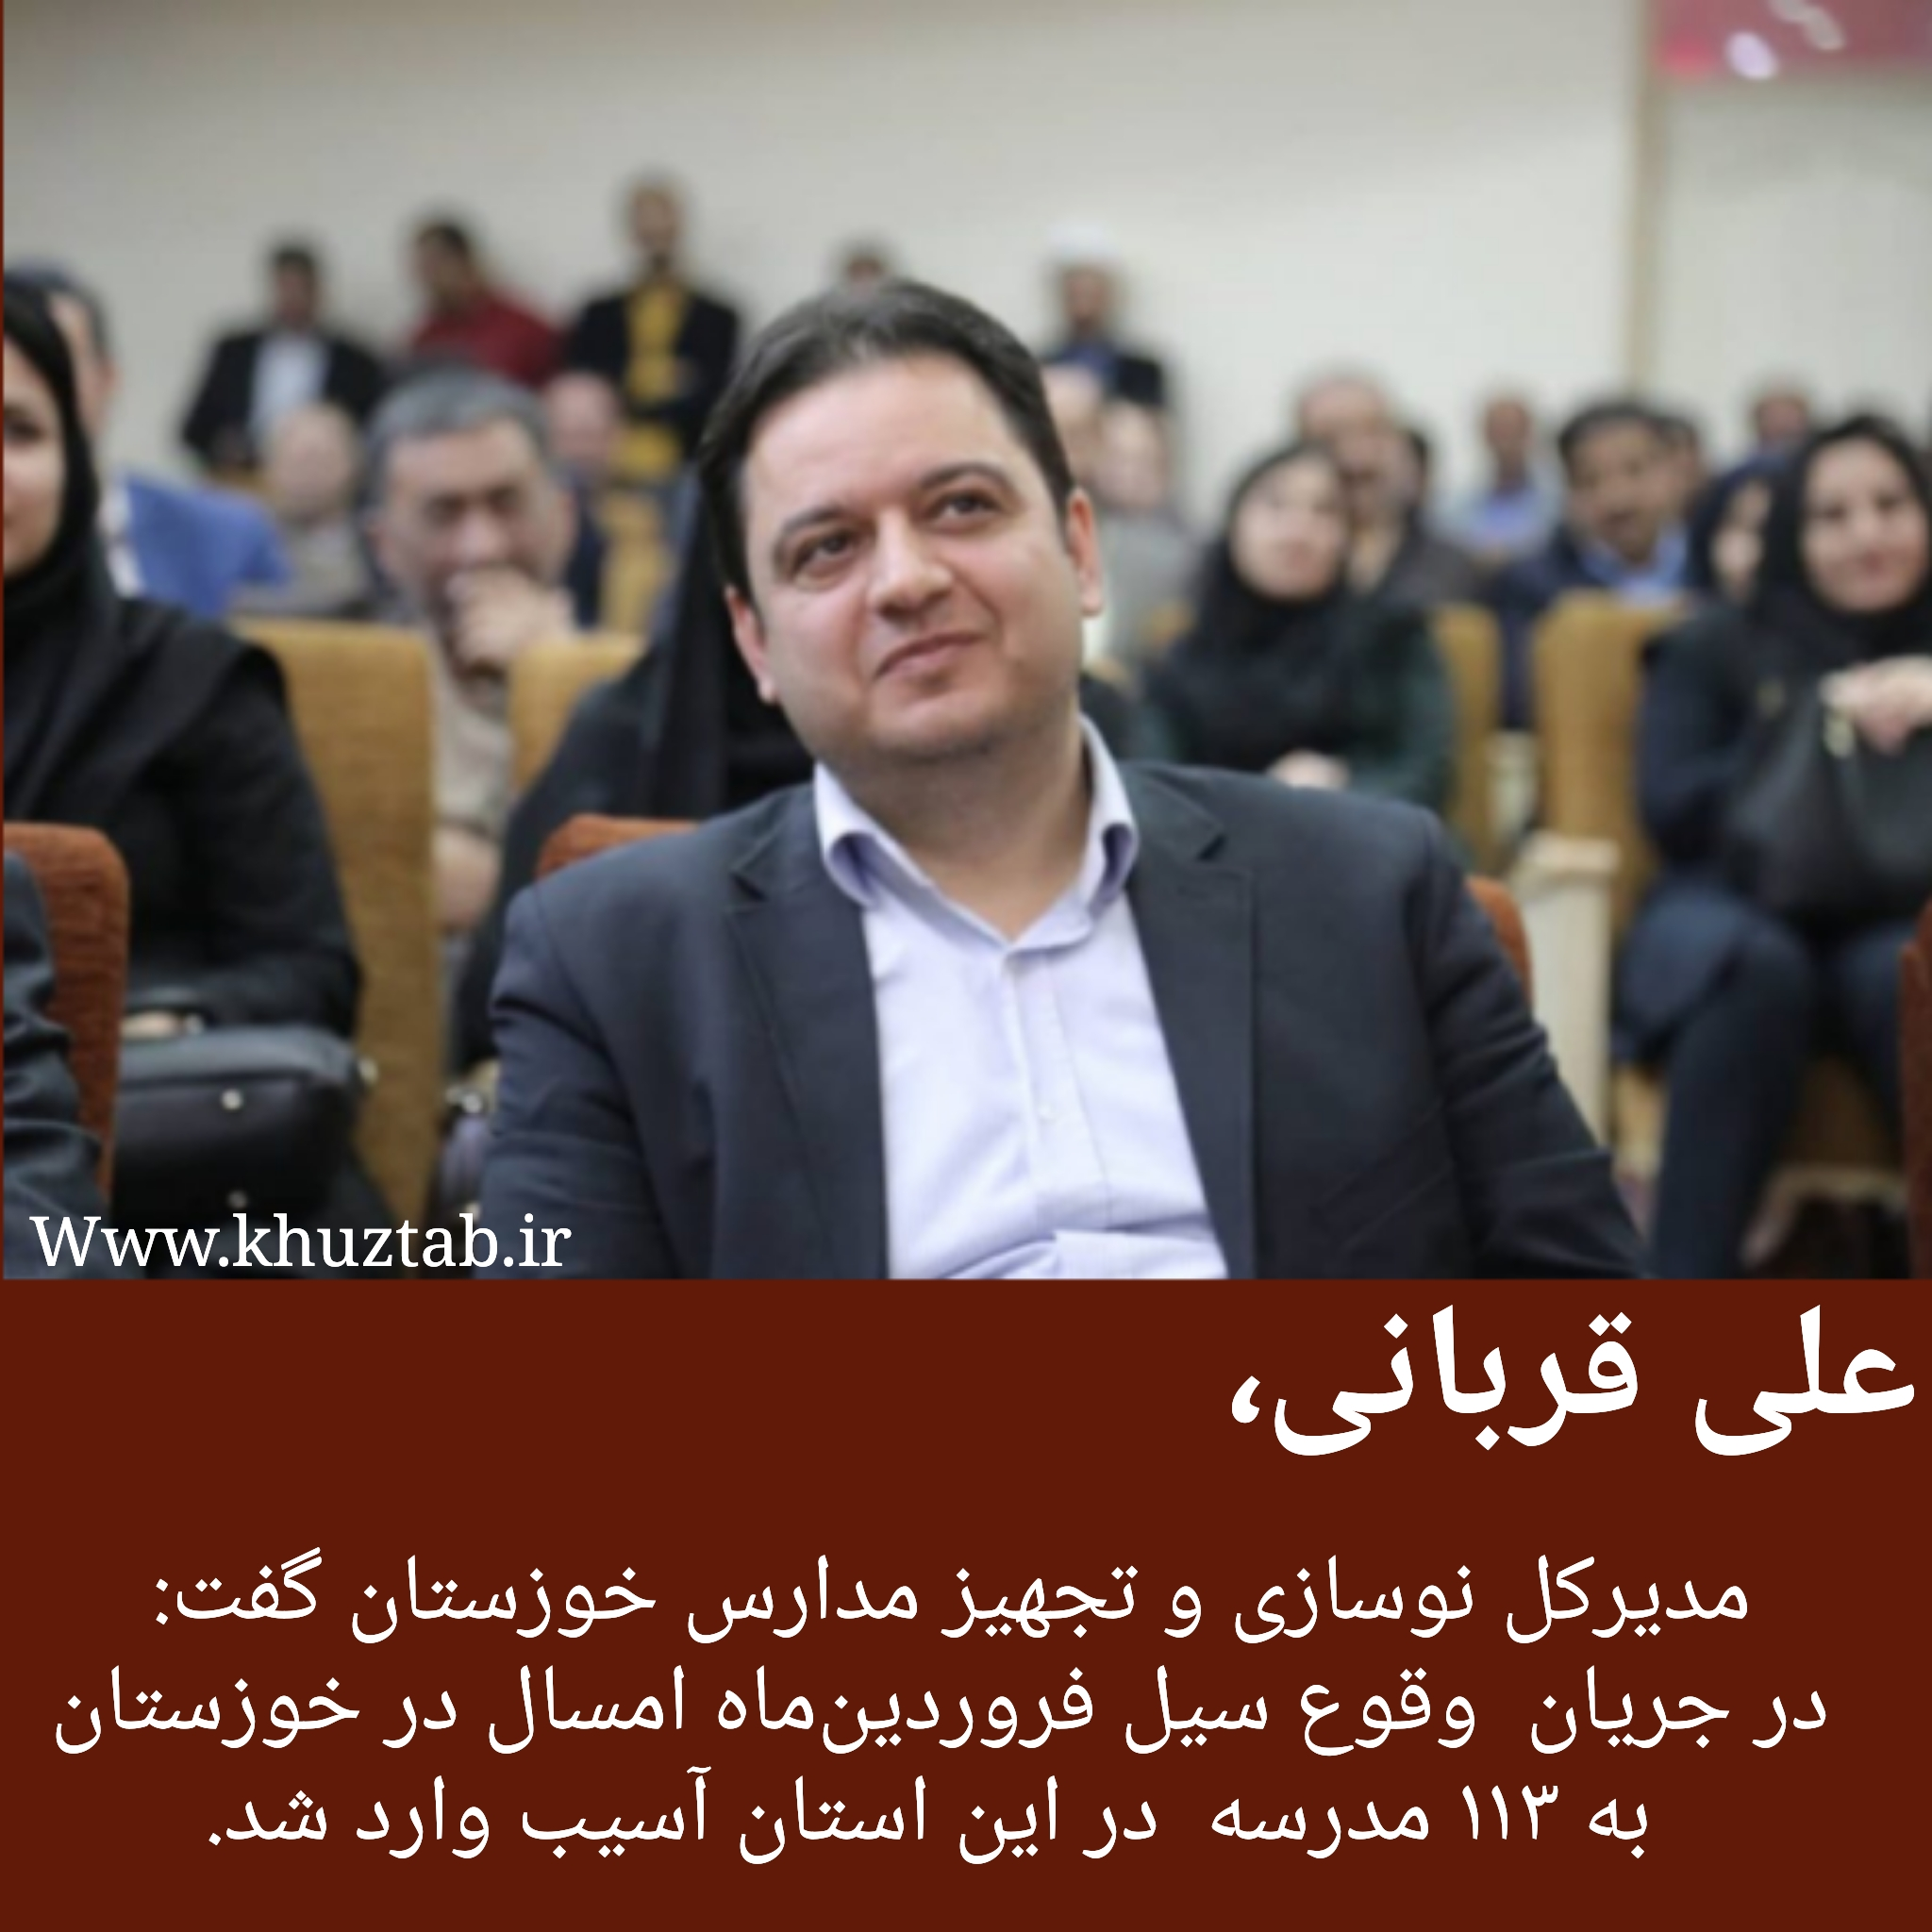 PhotoGrid 1564083406493 سیل به ۱۱۳ مدرسه خوزستان آسیب وارد کرد